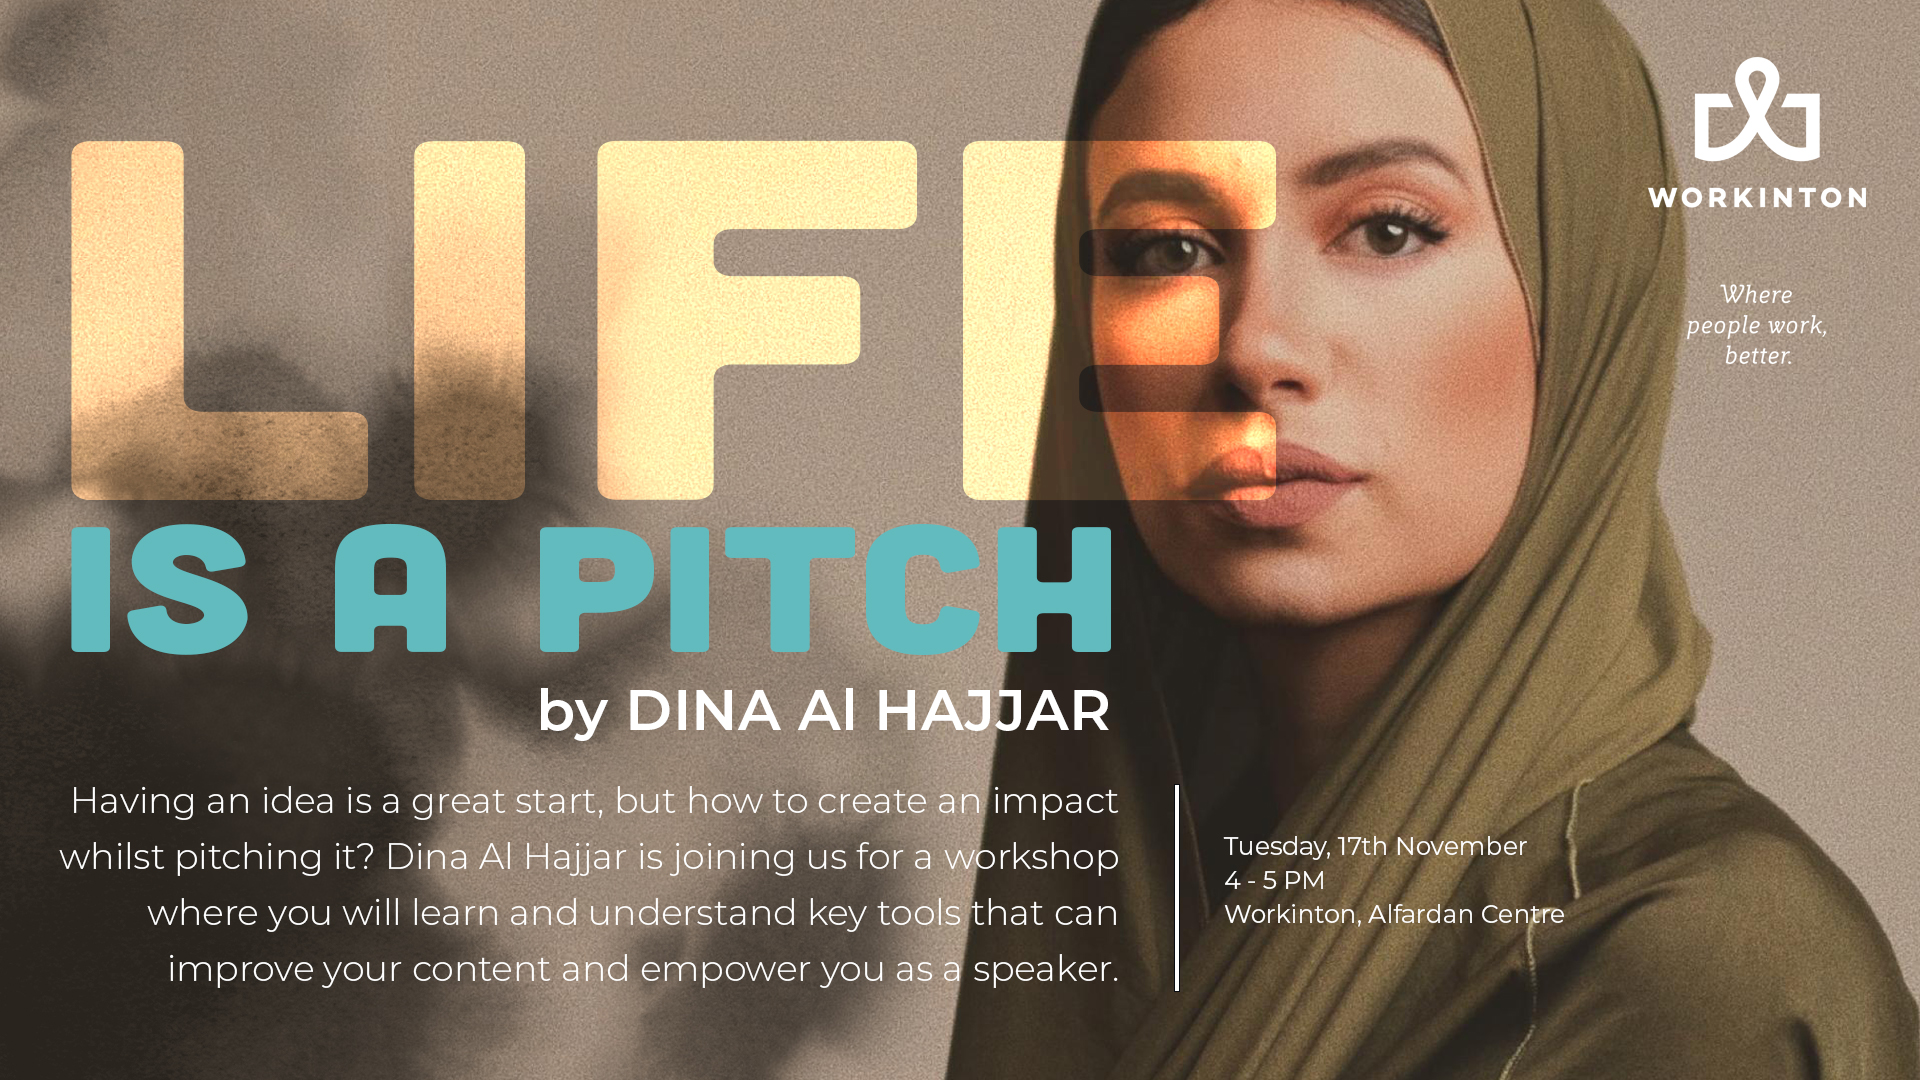 Marketing forum with speaker Dina Al Hajjar